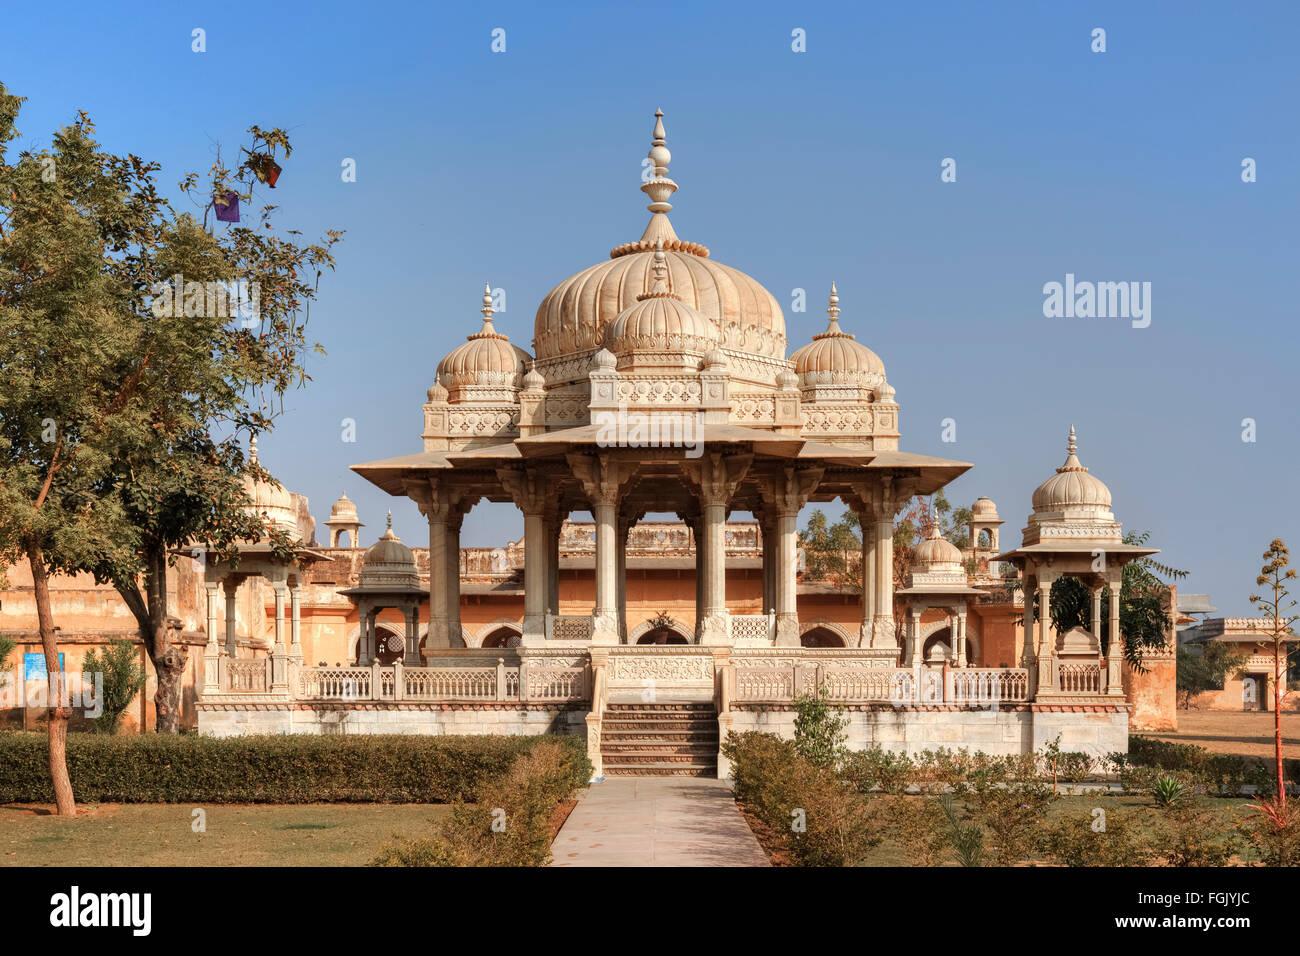 Gatore, Jaipur, Rajasthan, India Imagen De Stock